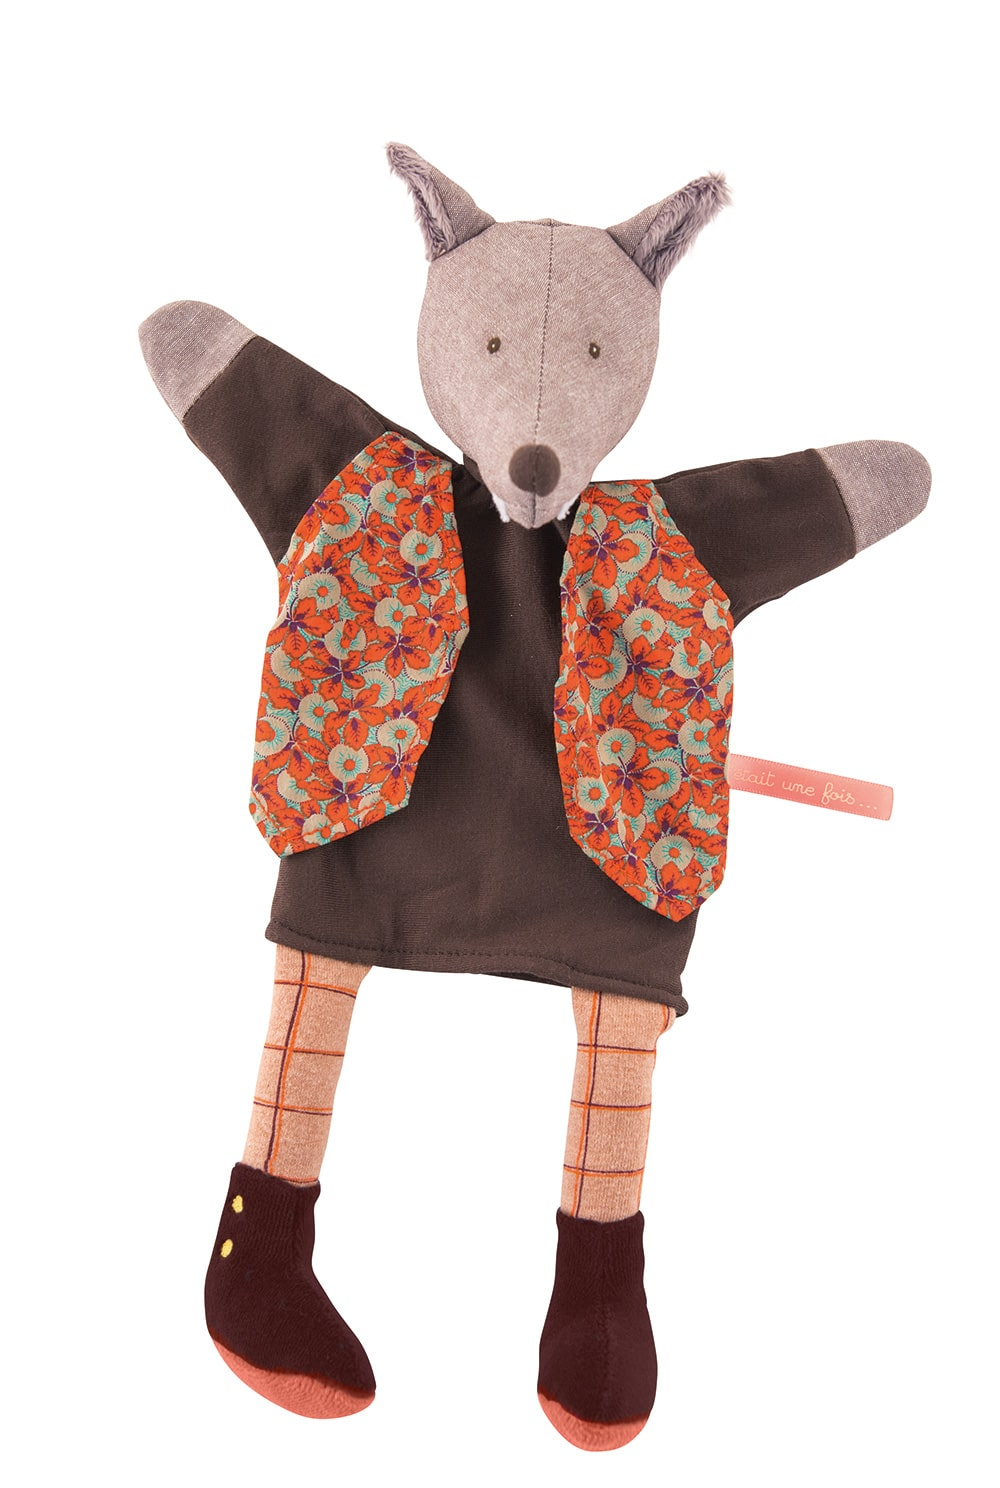 Il etait une fois - The gentleman Wolf puppet